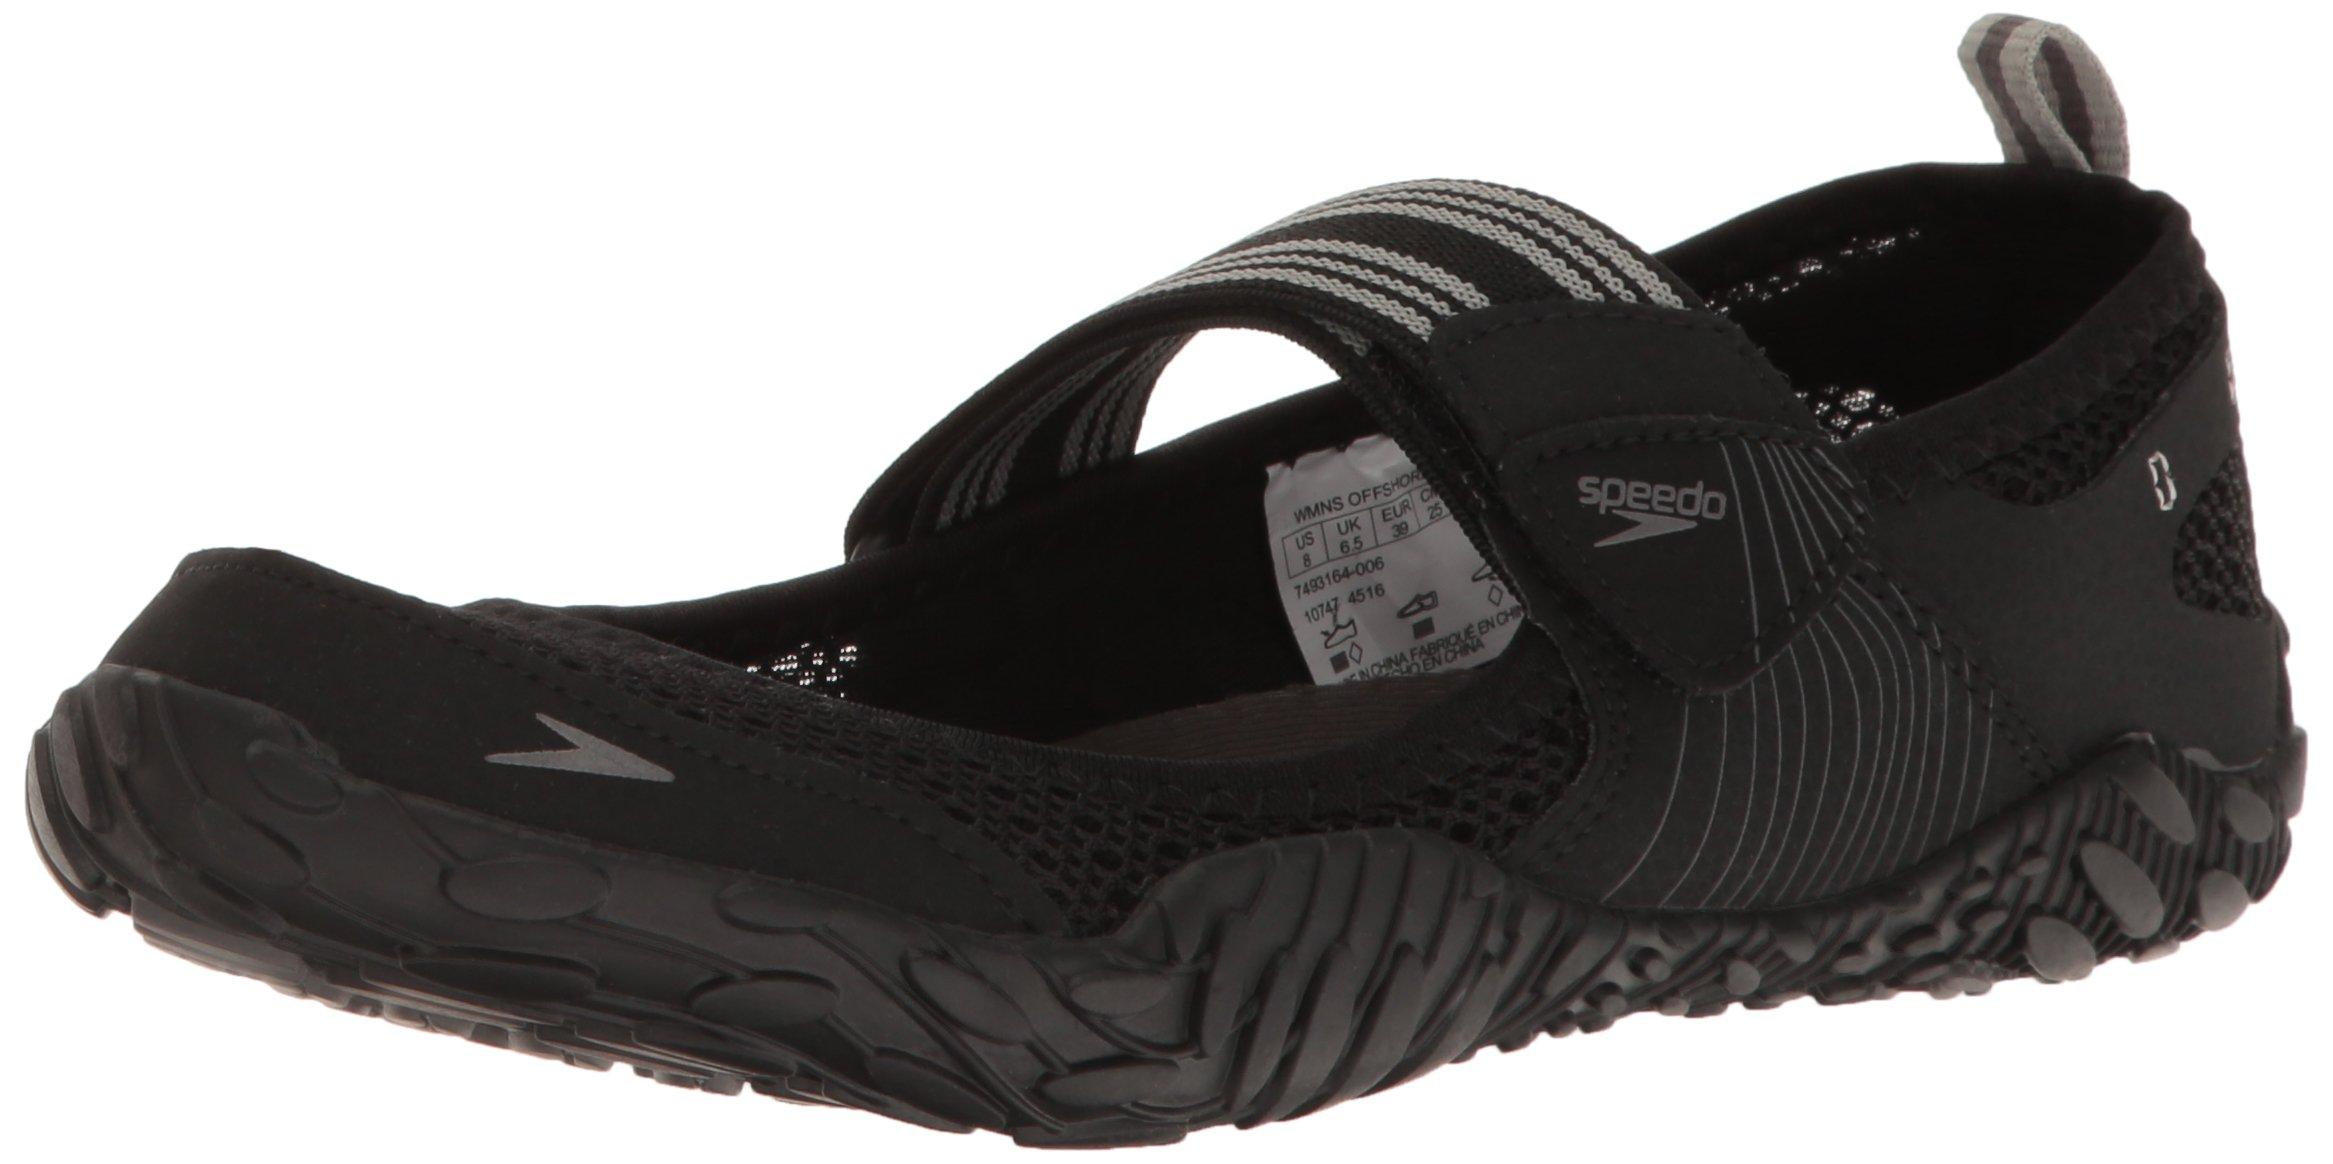 Speedo Women's Offshore Strap Athletic Water Shoe, Black/Black, 6 C/D US